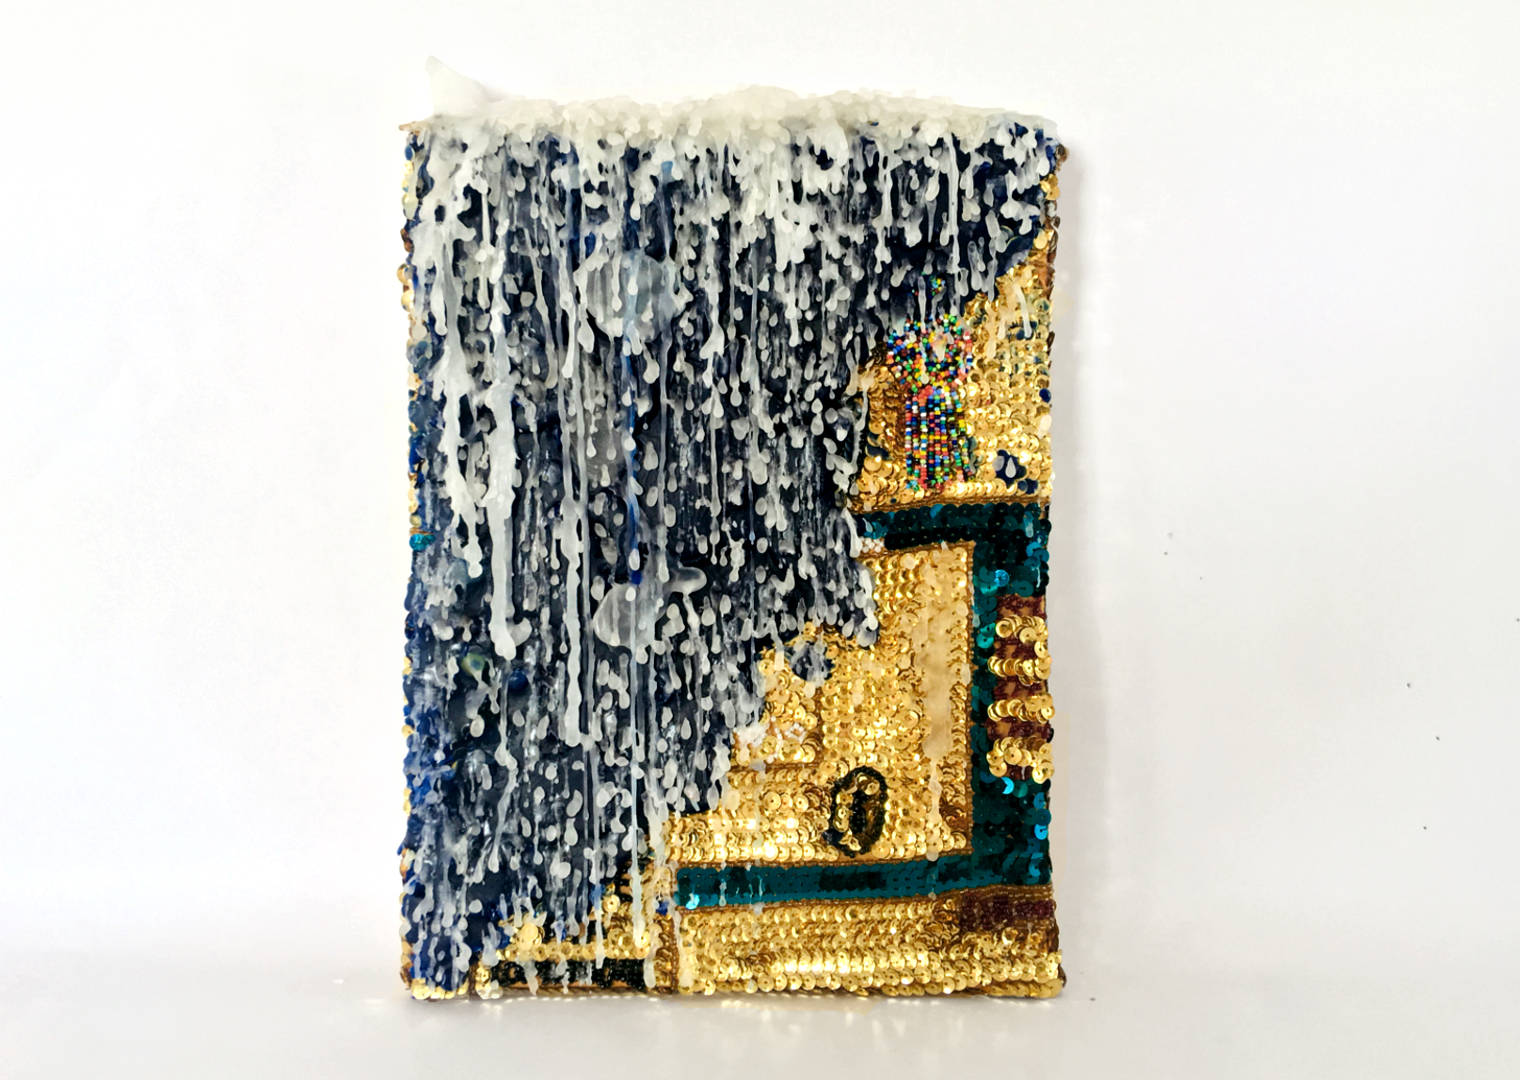 Daniel González, Spiritual Painting, 2019